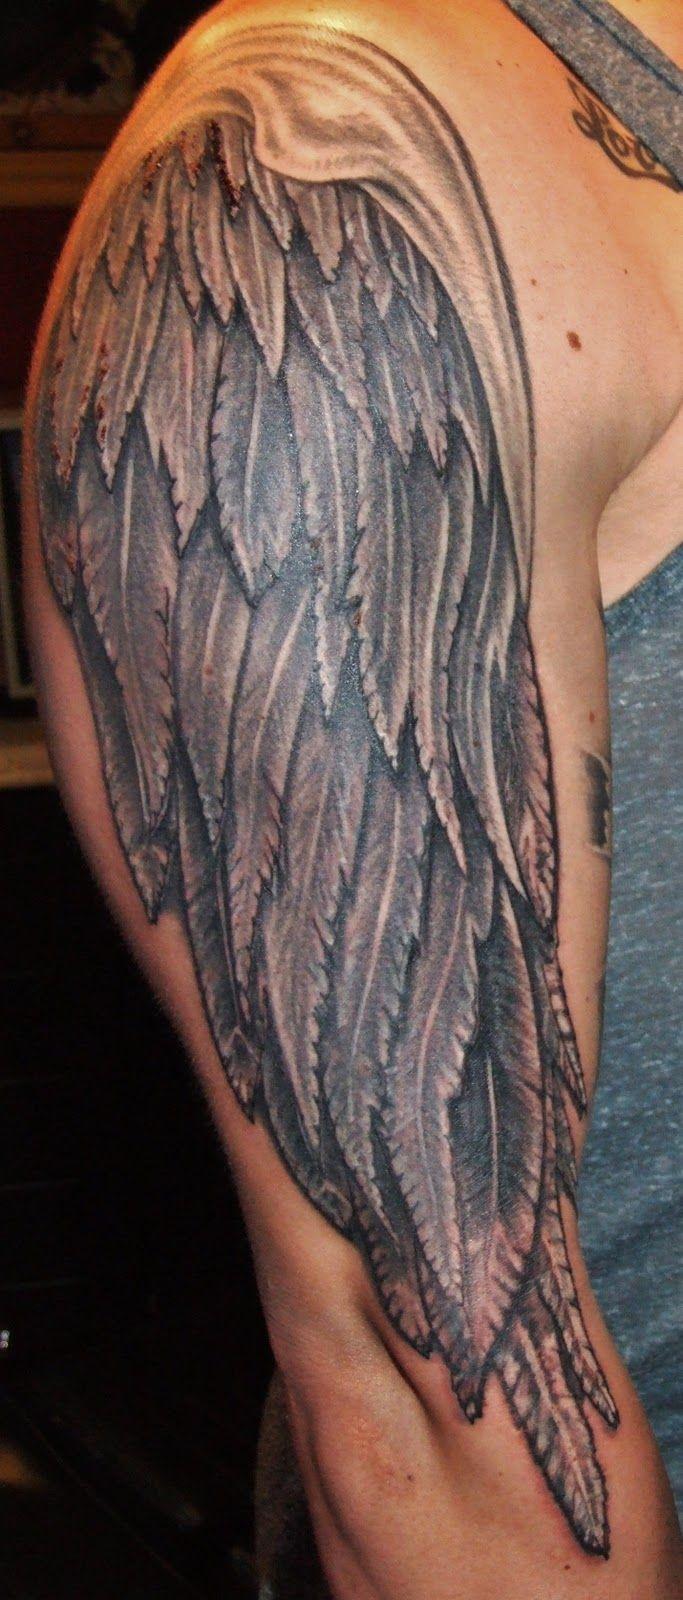 Tattoo Wings On Arm: Tattoos Of Wings Full Arm Tattoo